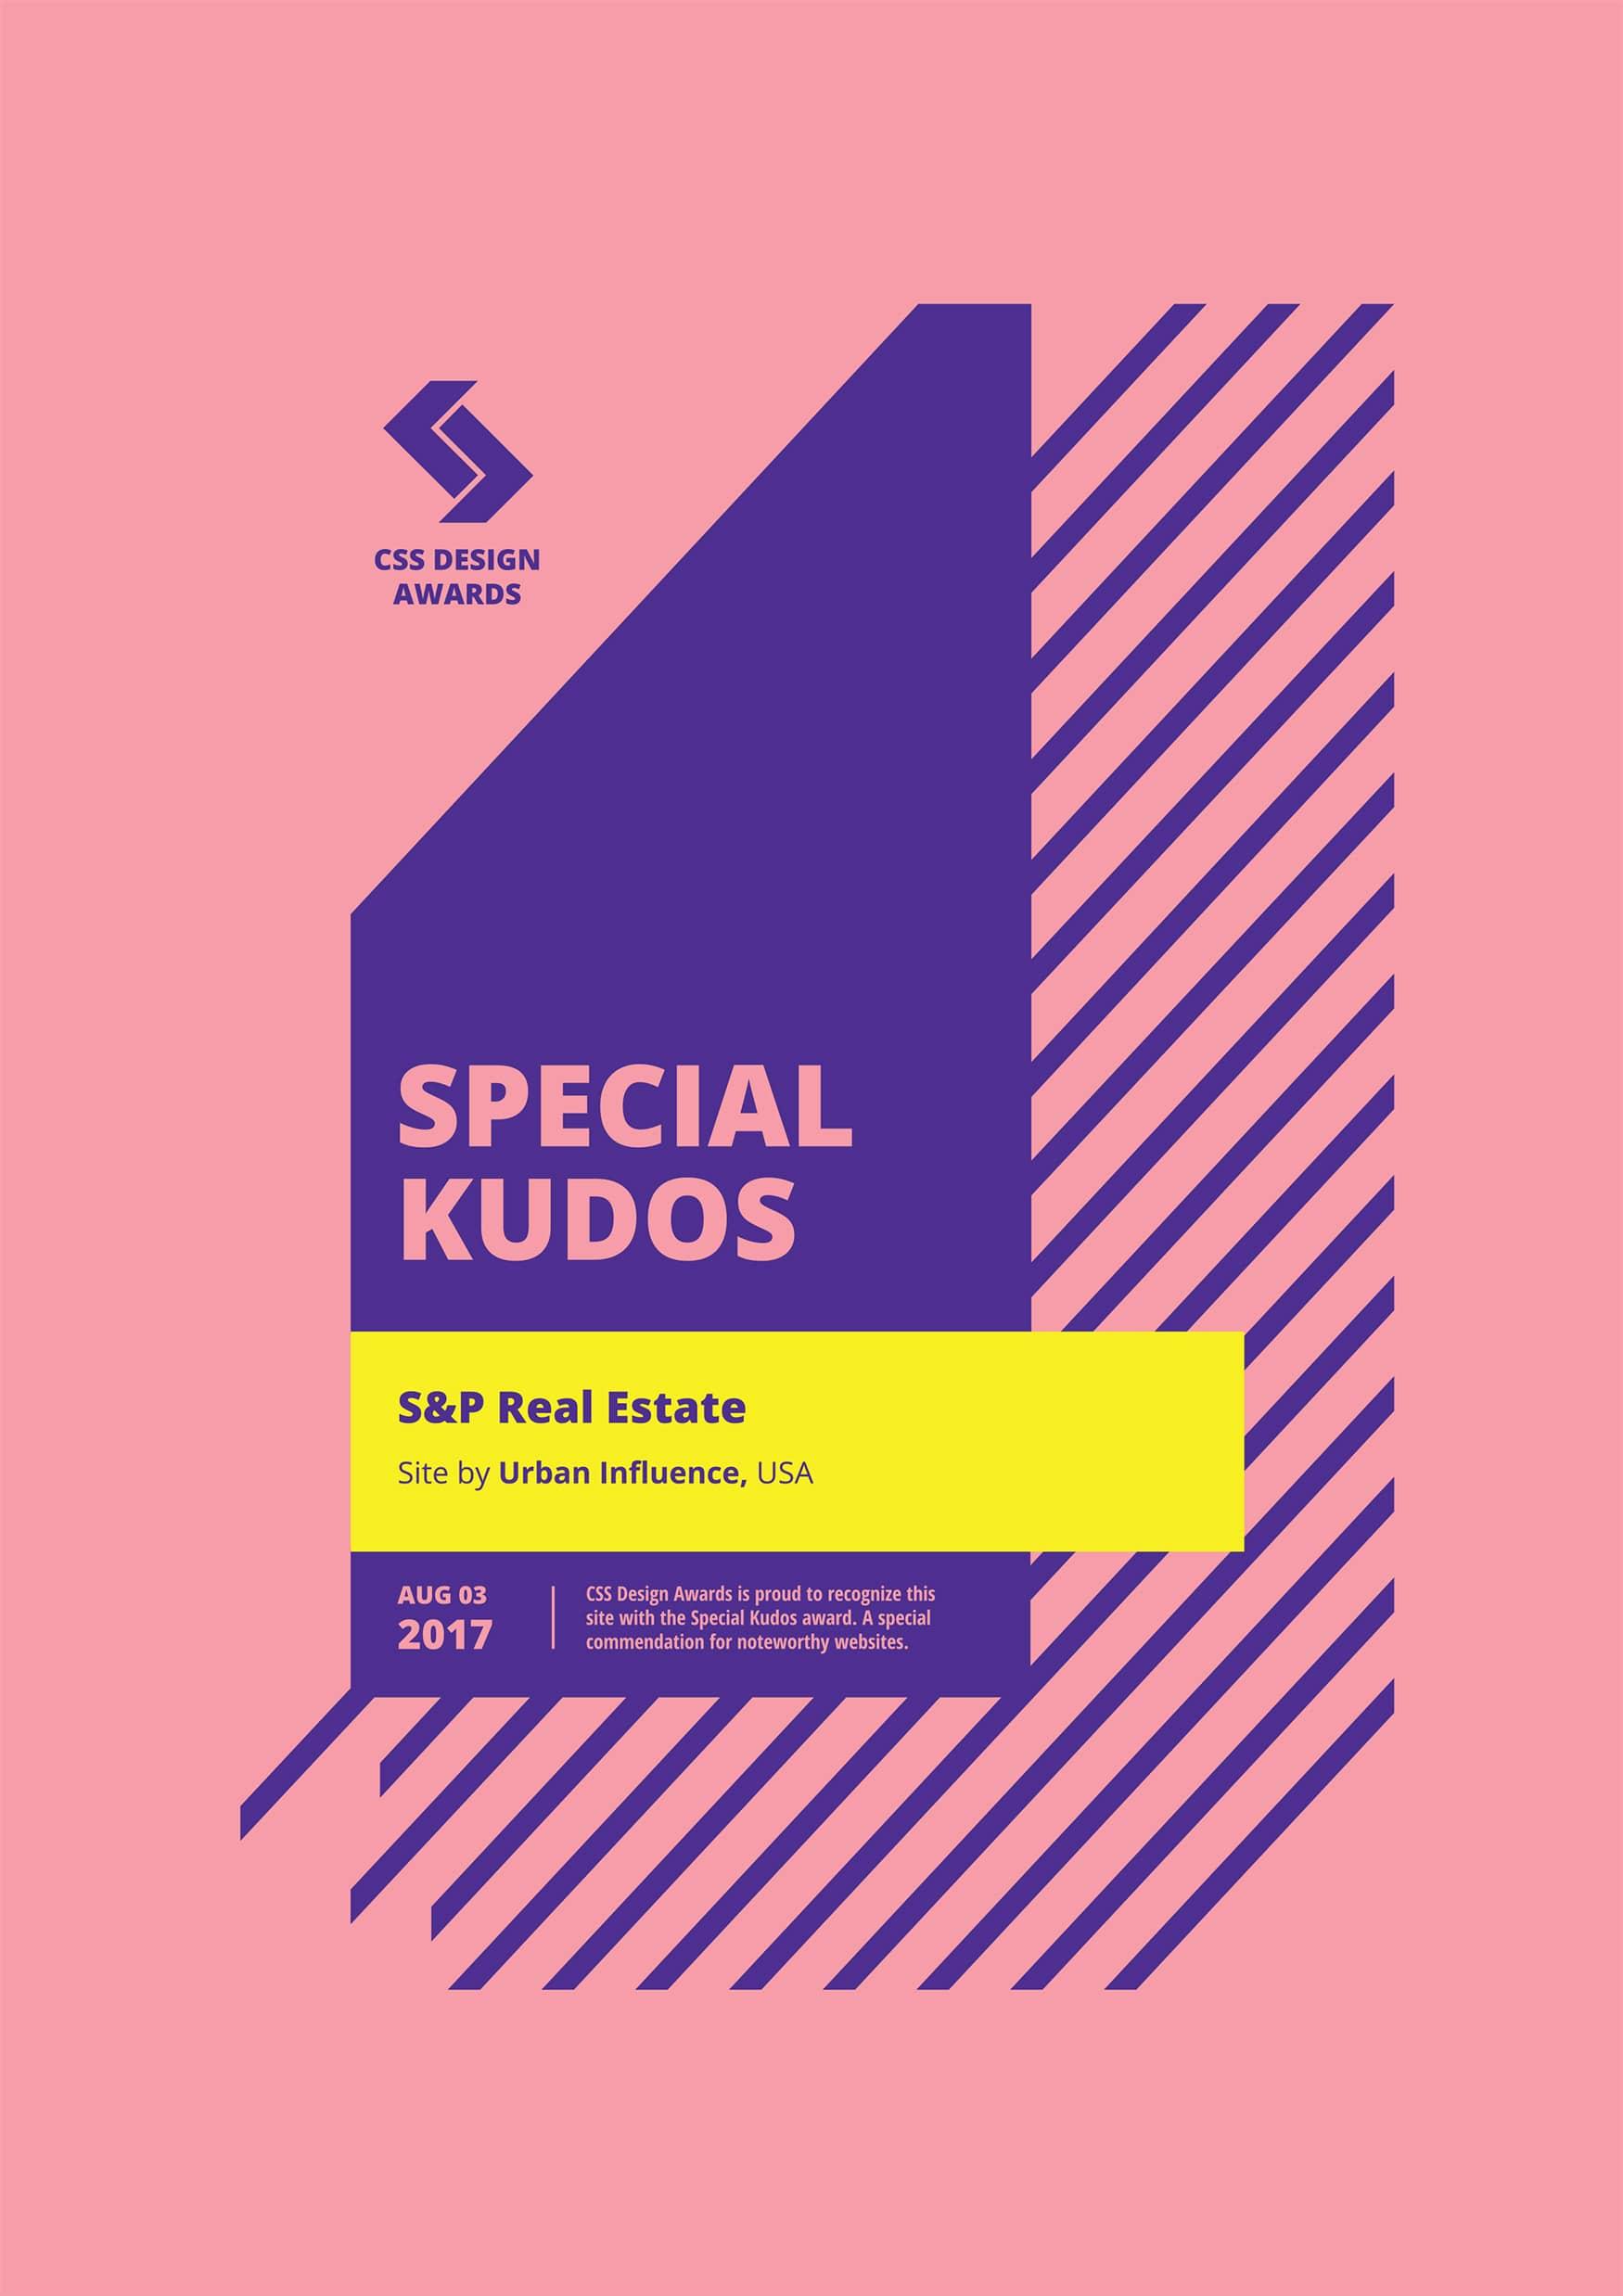 S&P Real Estate CSS Design Awards